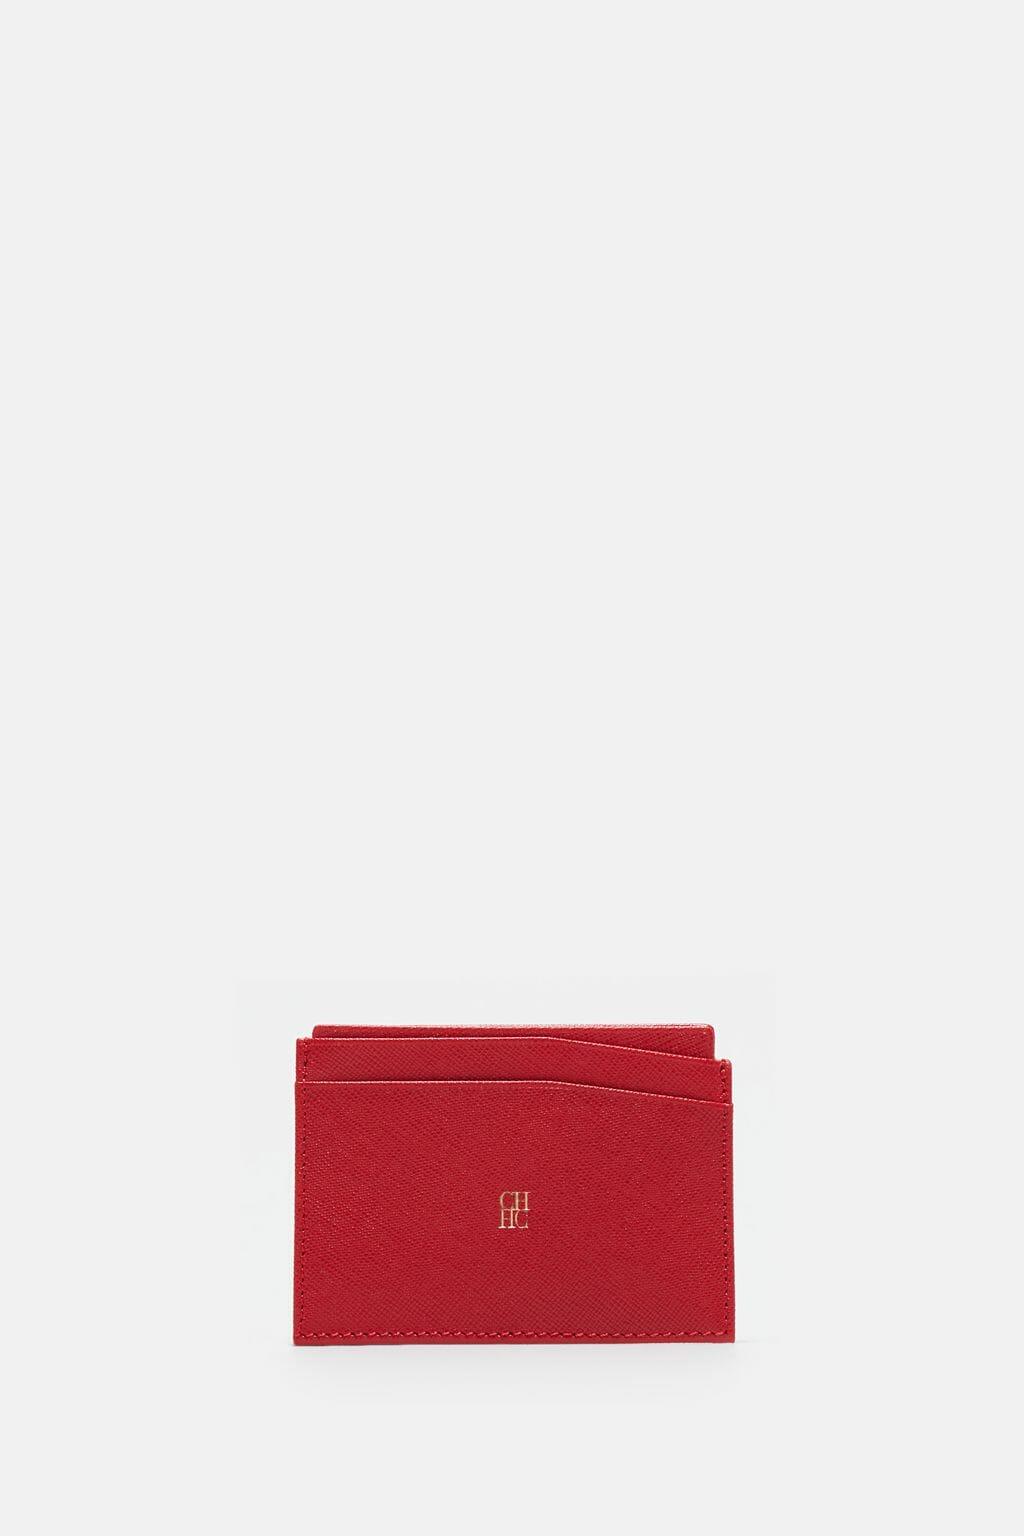 CH-Carolina-herrera-men-accessories-look-11